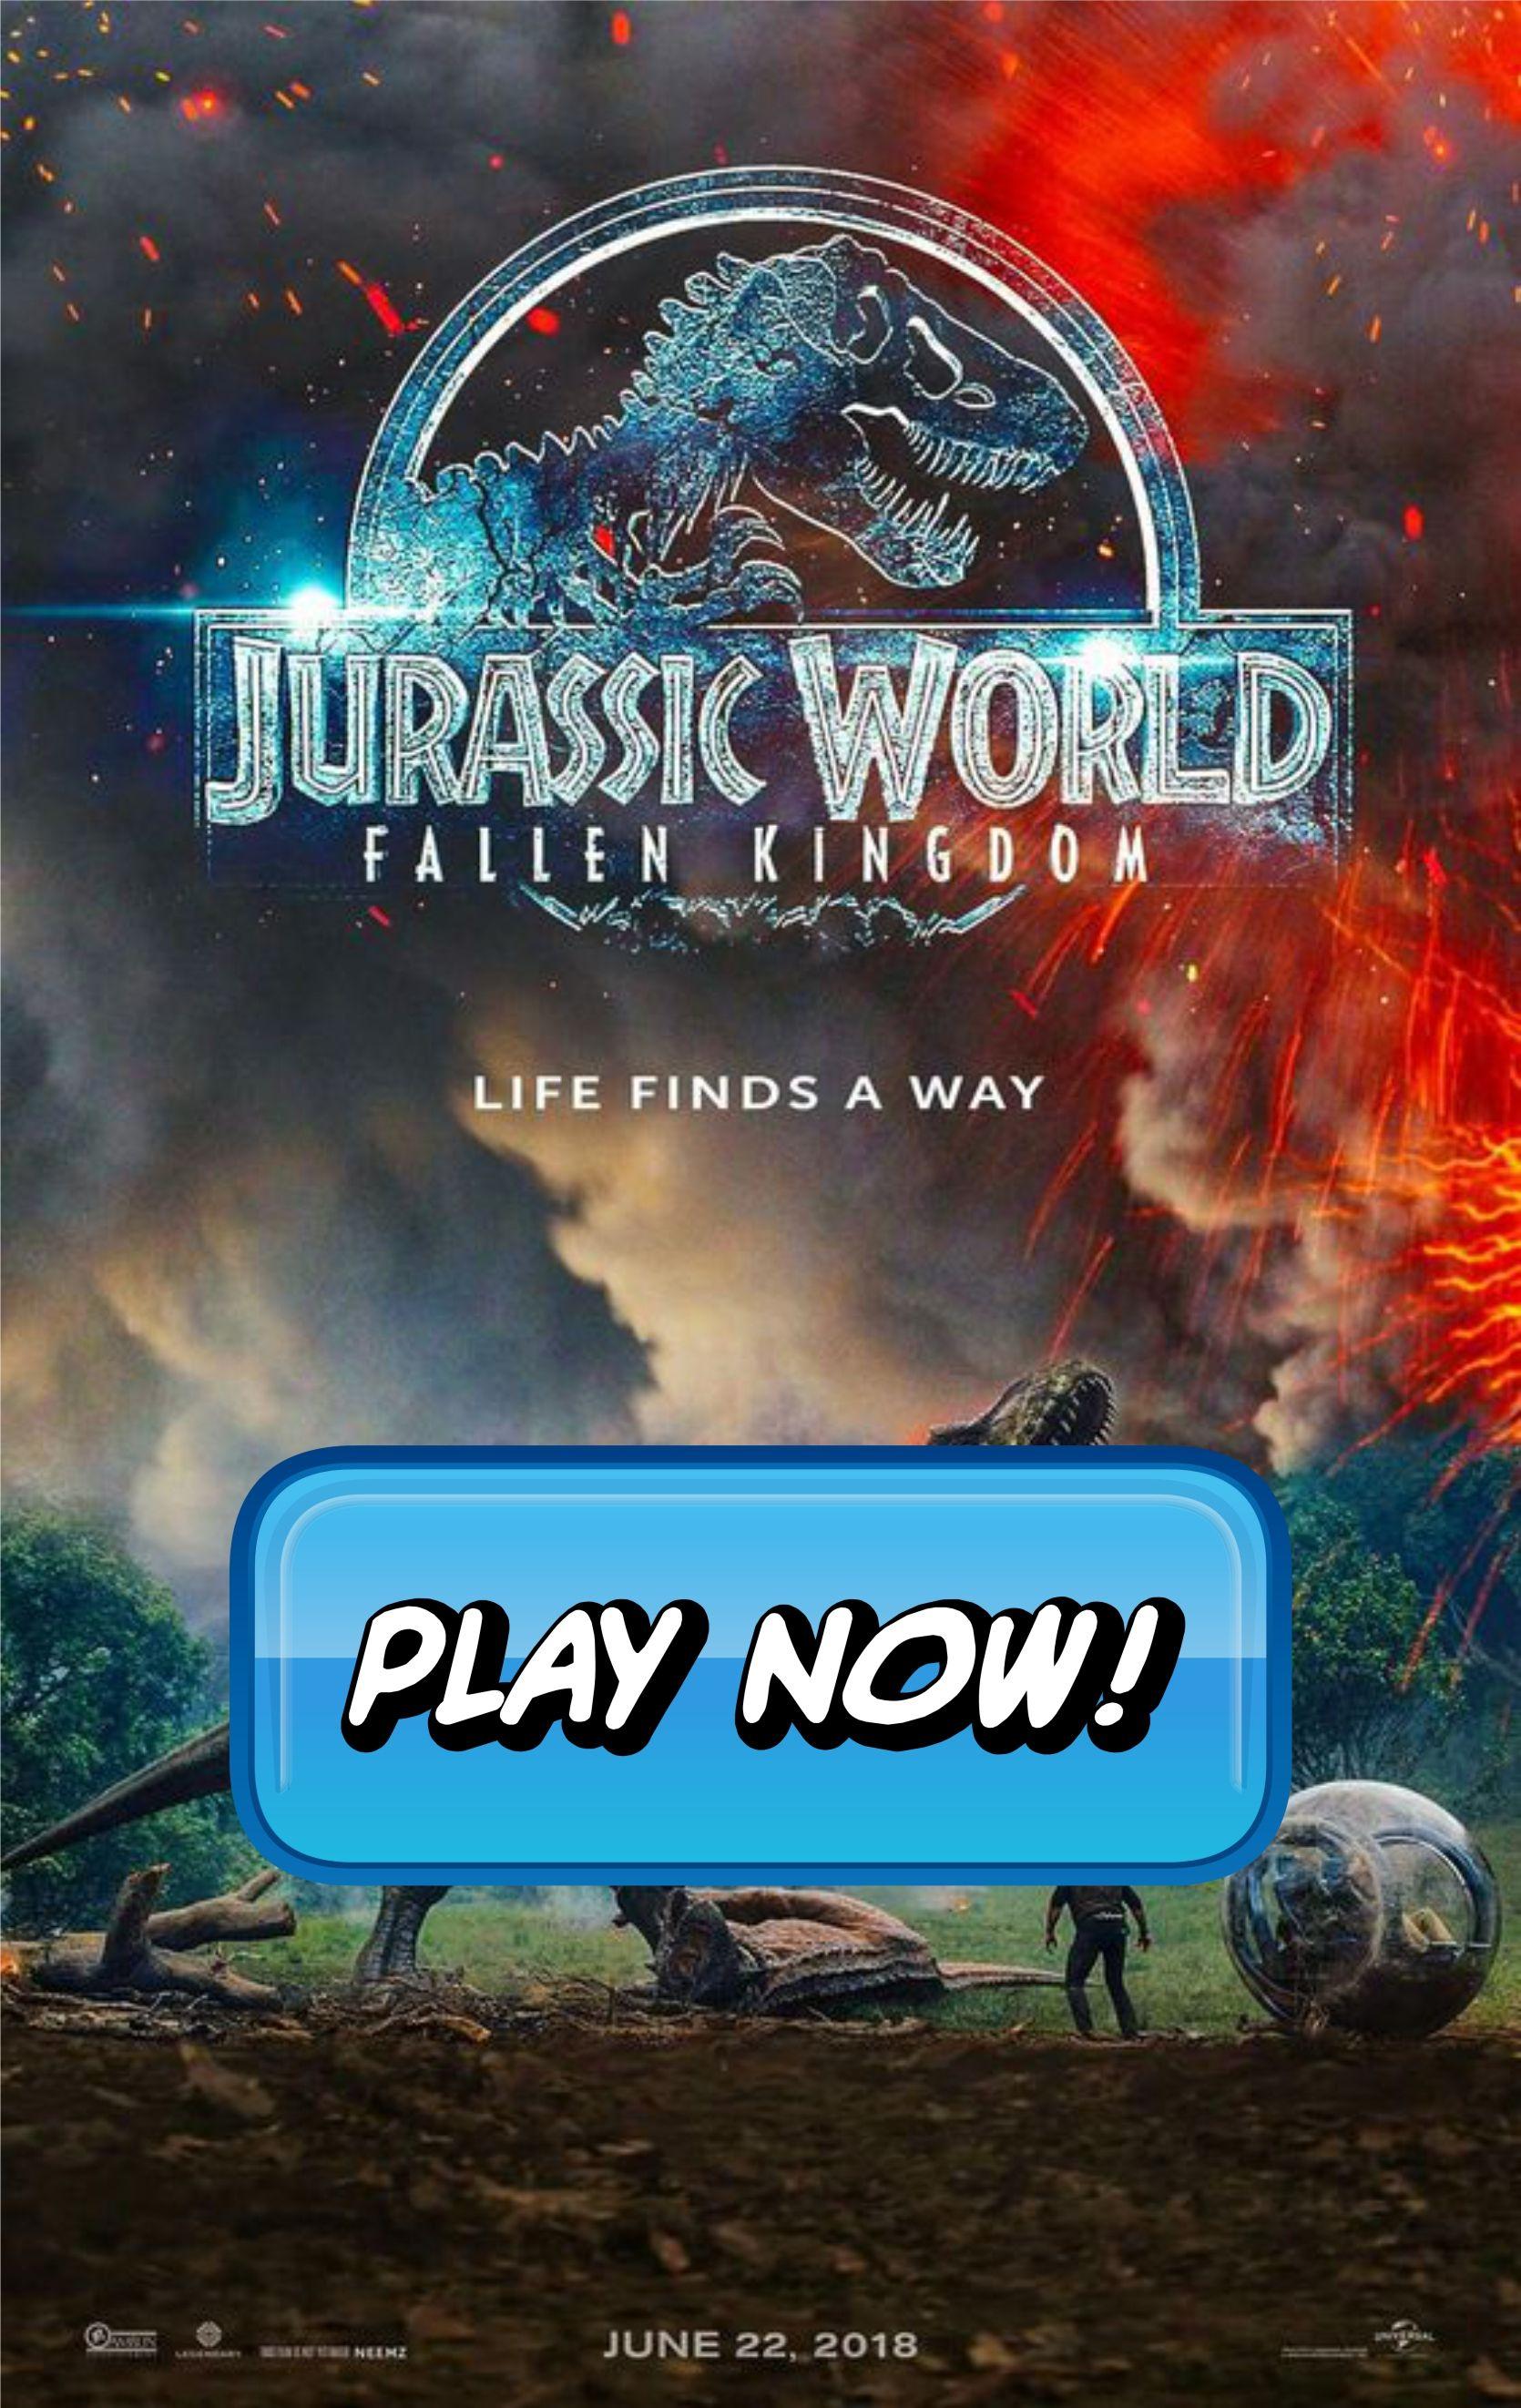 Ver Jurassic World El Reino Caido 2018 Online Espanol Pelicula Hd Completa Falling Kingdoms Jurassic World Fallen Kingdom Jurassic World